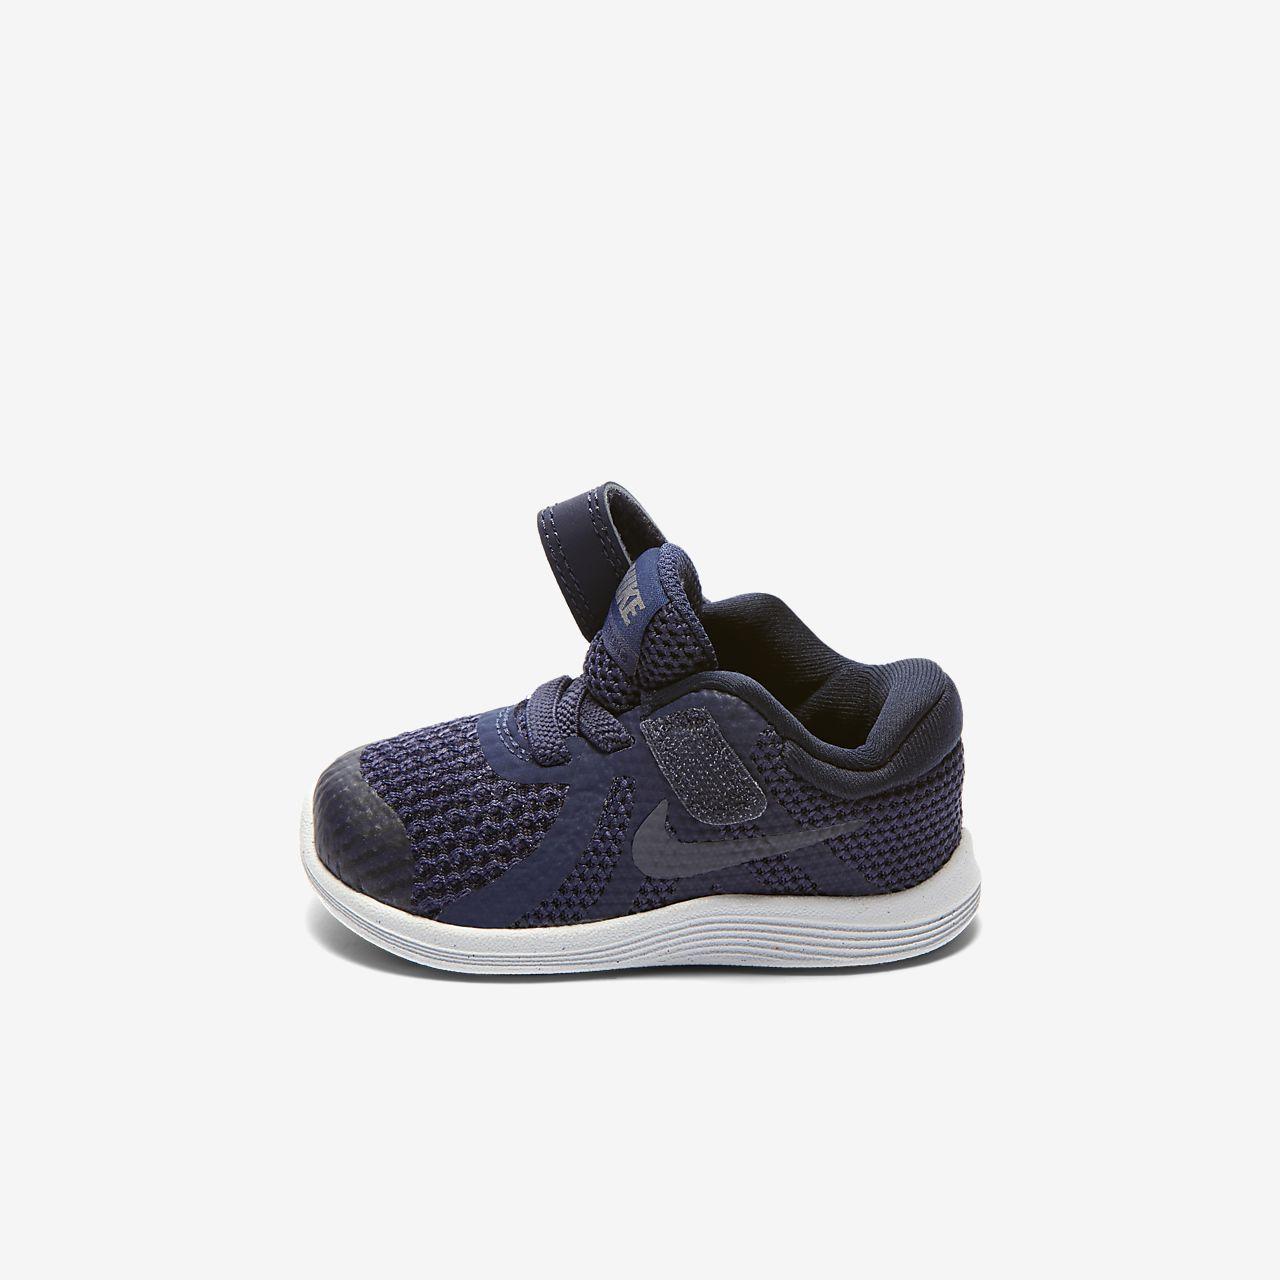 f1c280694841 Nike Revolution 4 Baby   Toddler Shoe. Nike.com LU